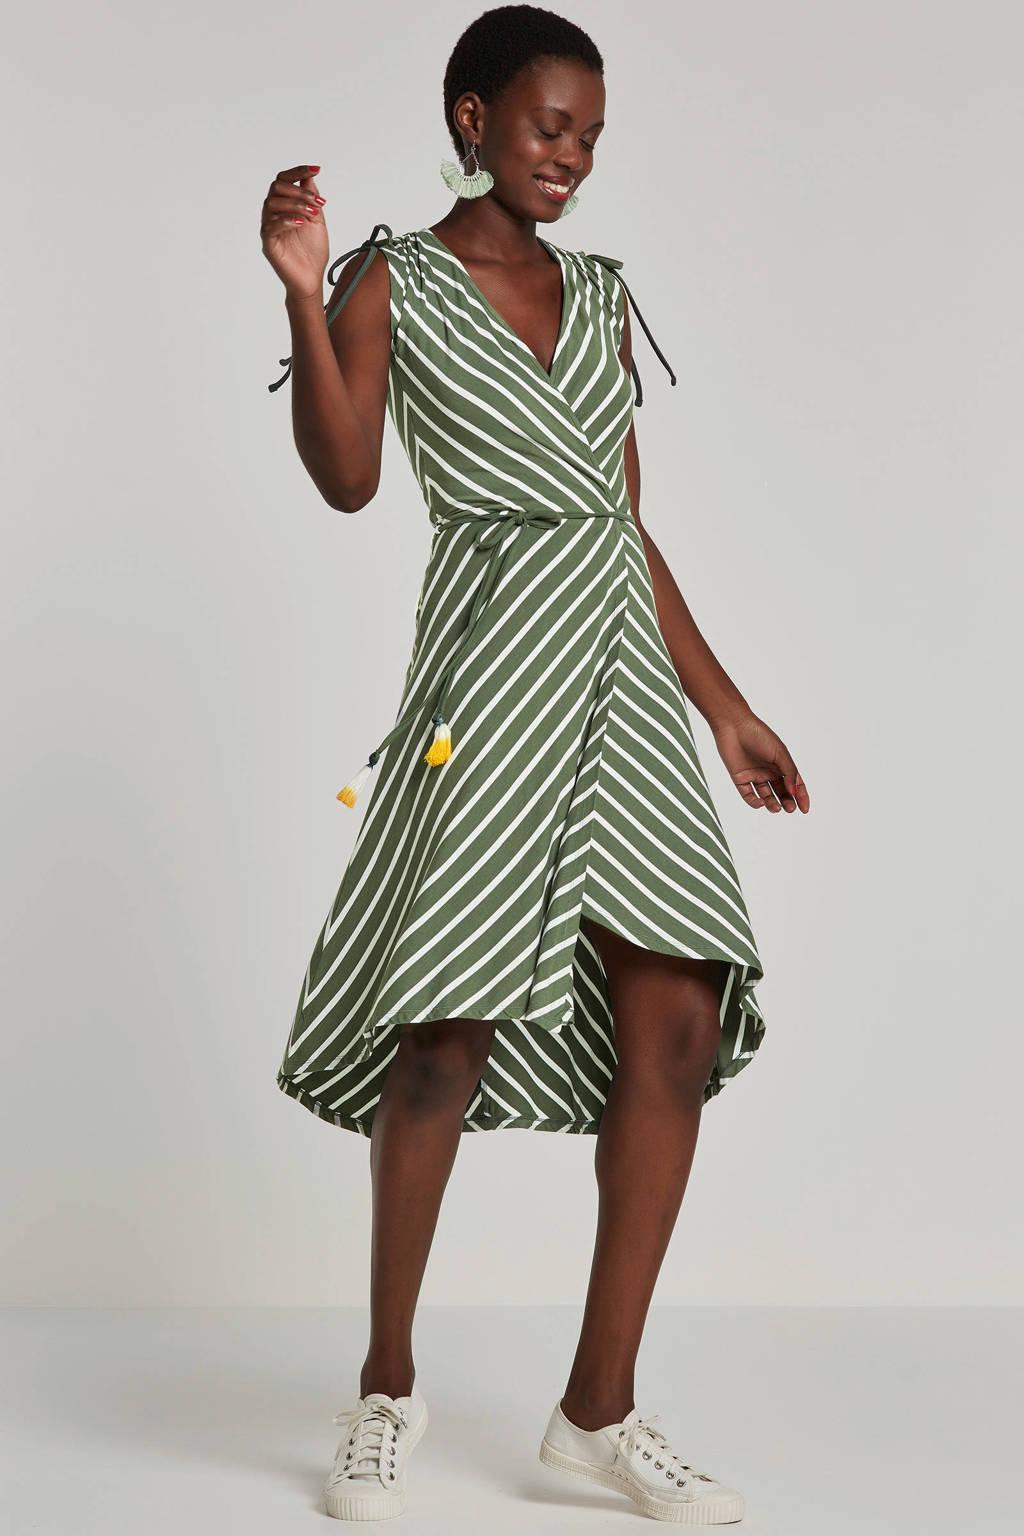 whkmp's beachwave wikkel-look jurk, Kakigroen/wit